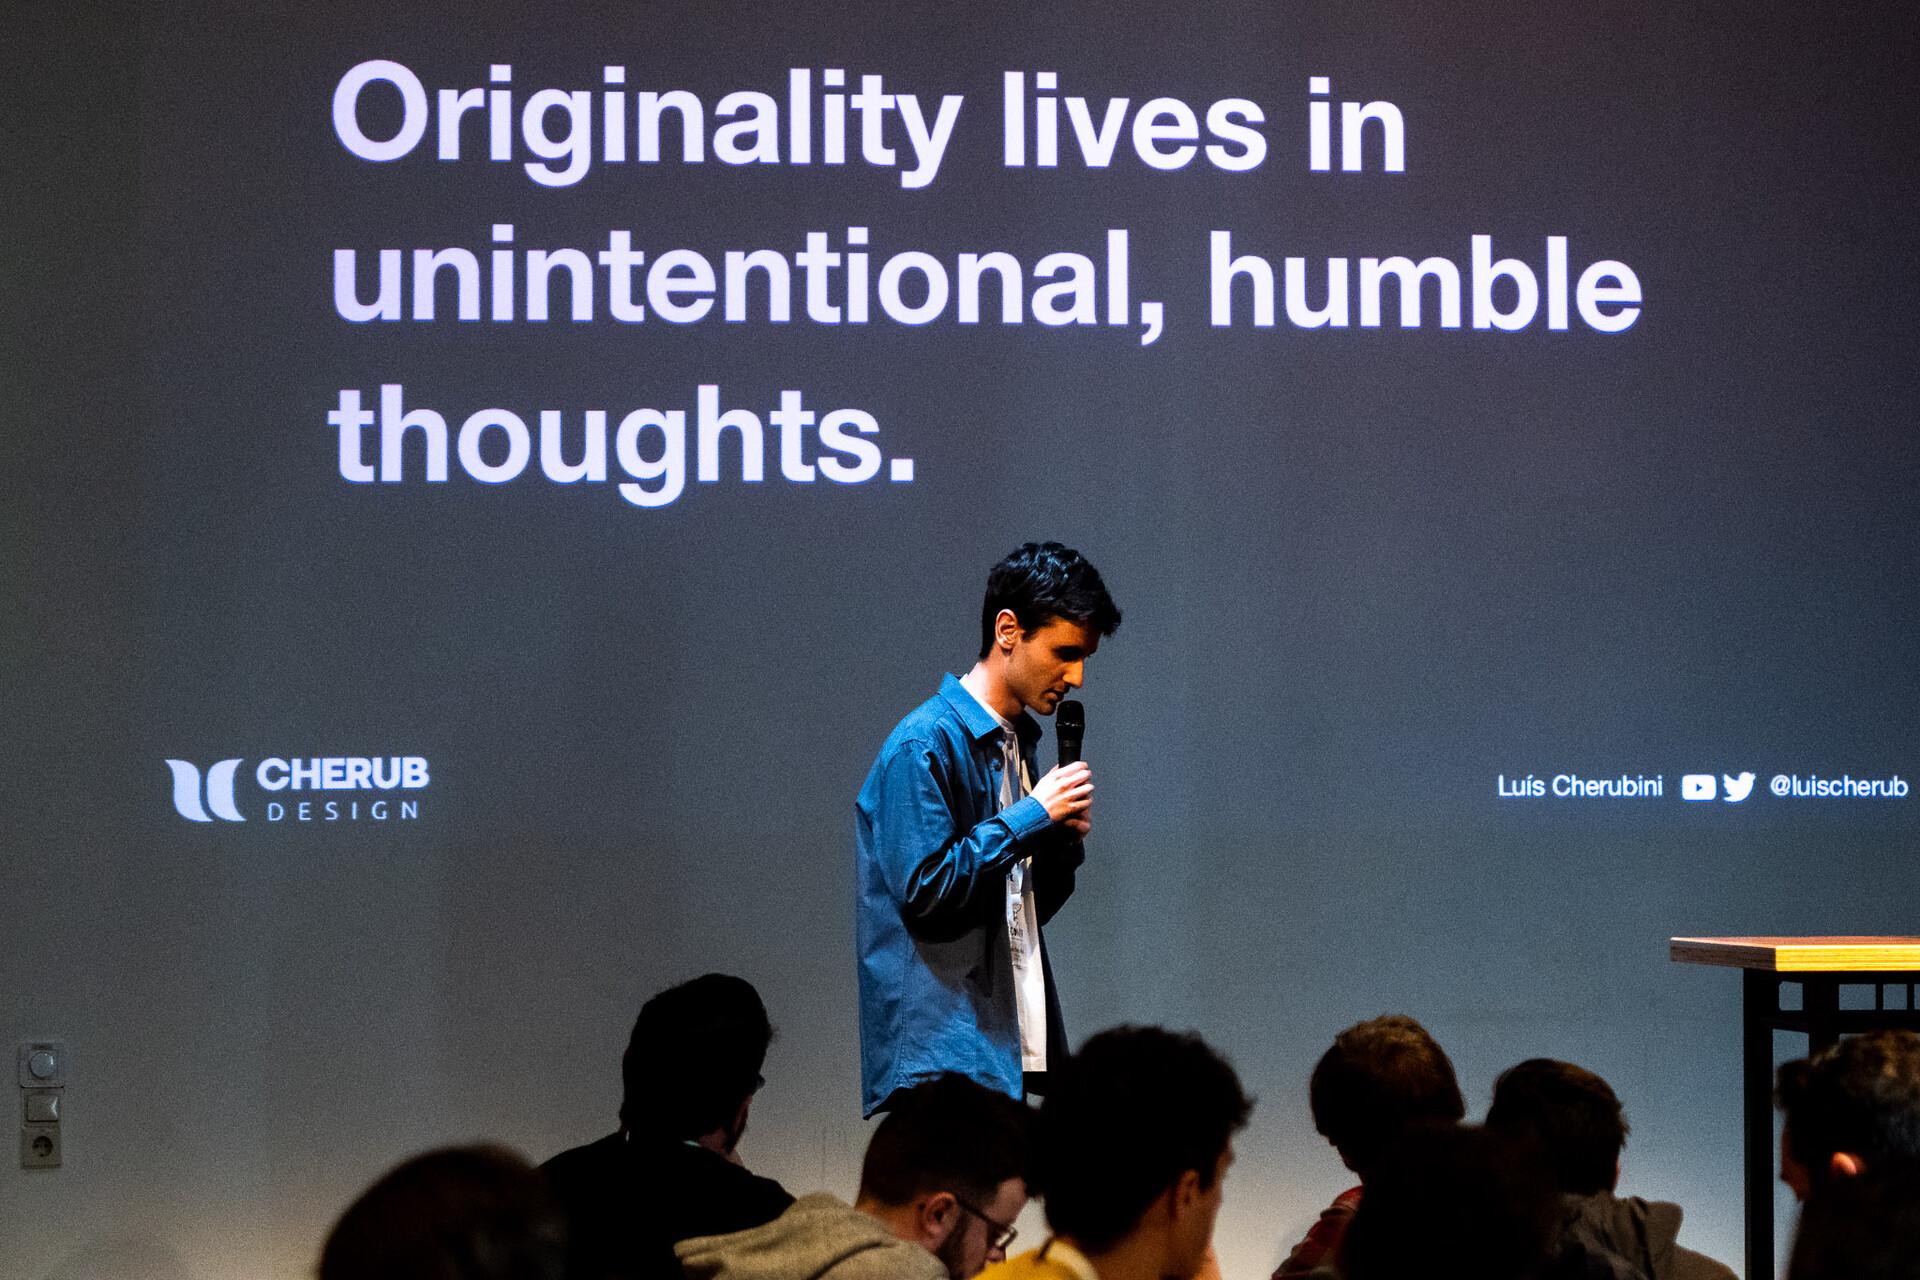 Luis cherubini jdh 20191025 blender conferentie 2019 095 foto jelmer de haas web 1